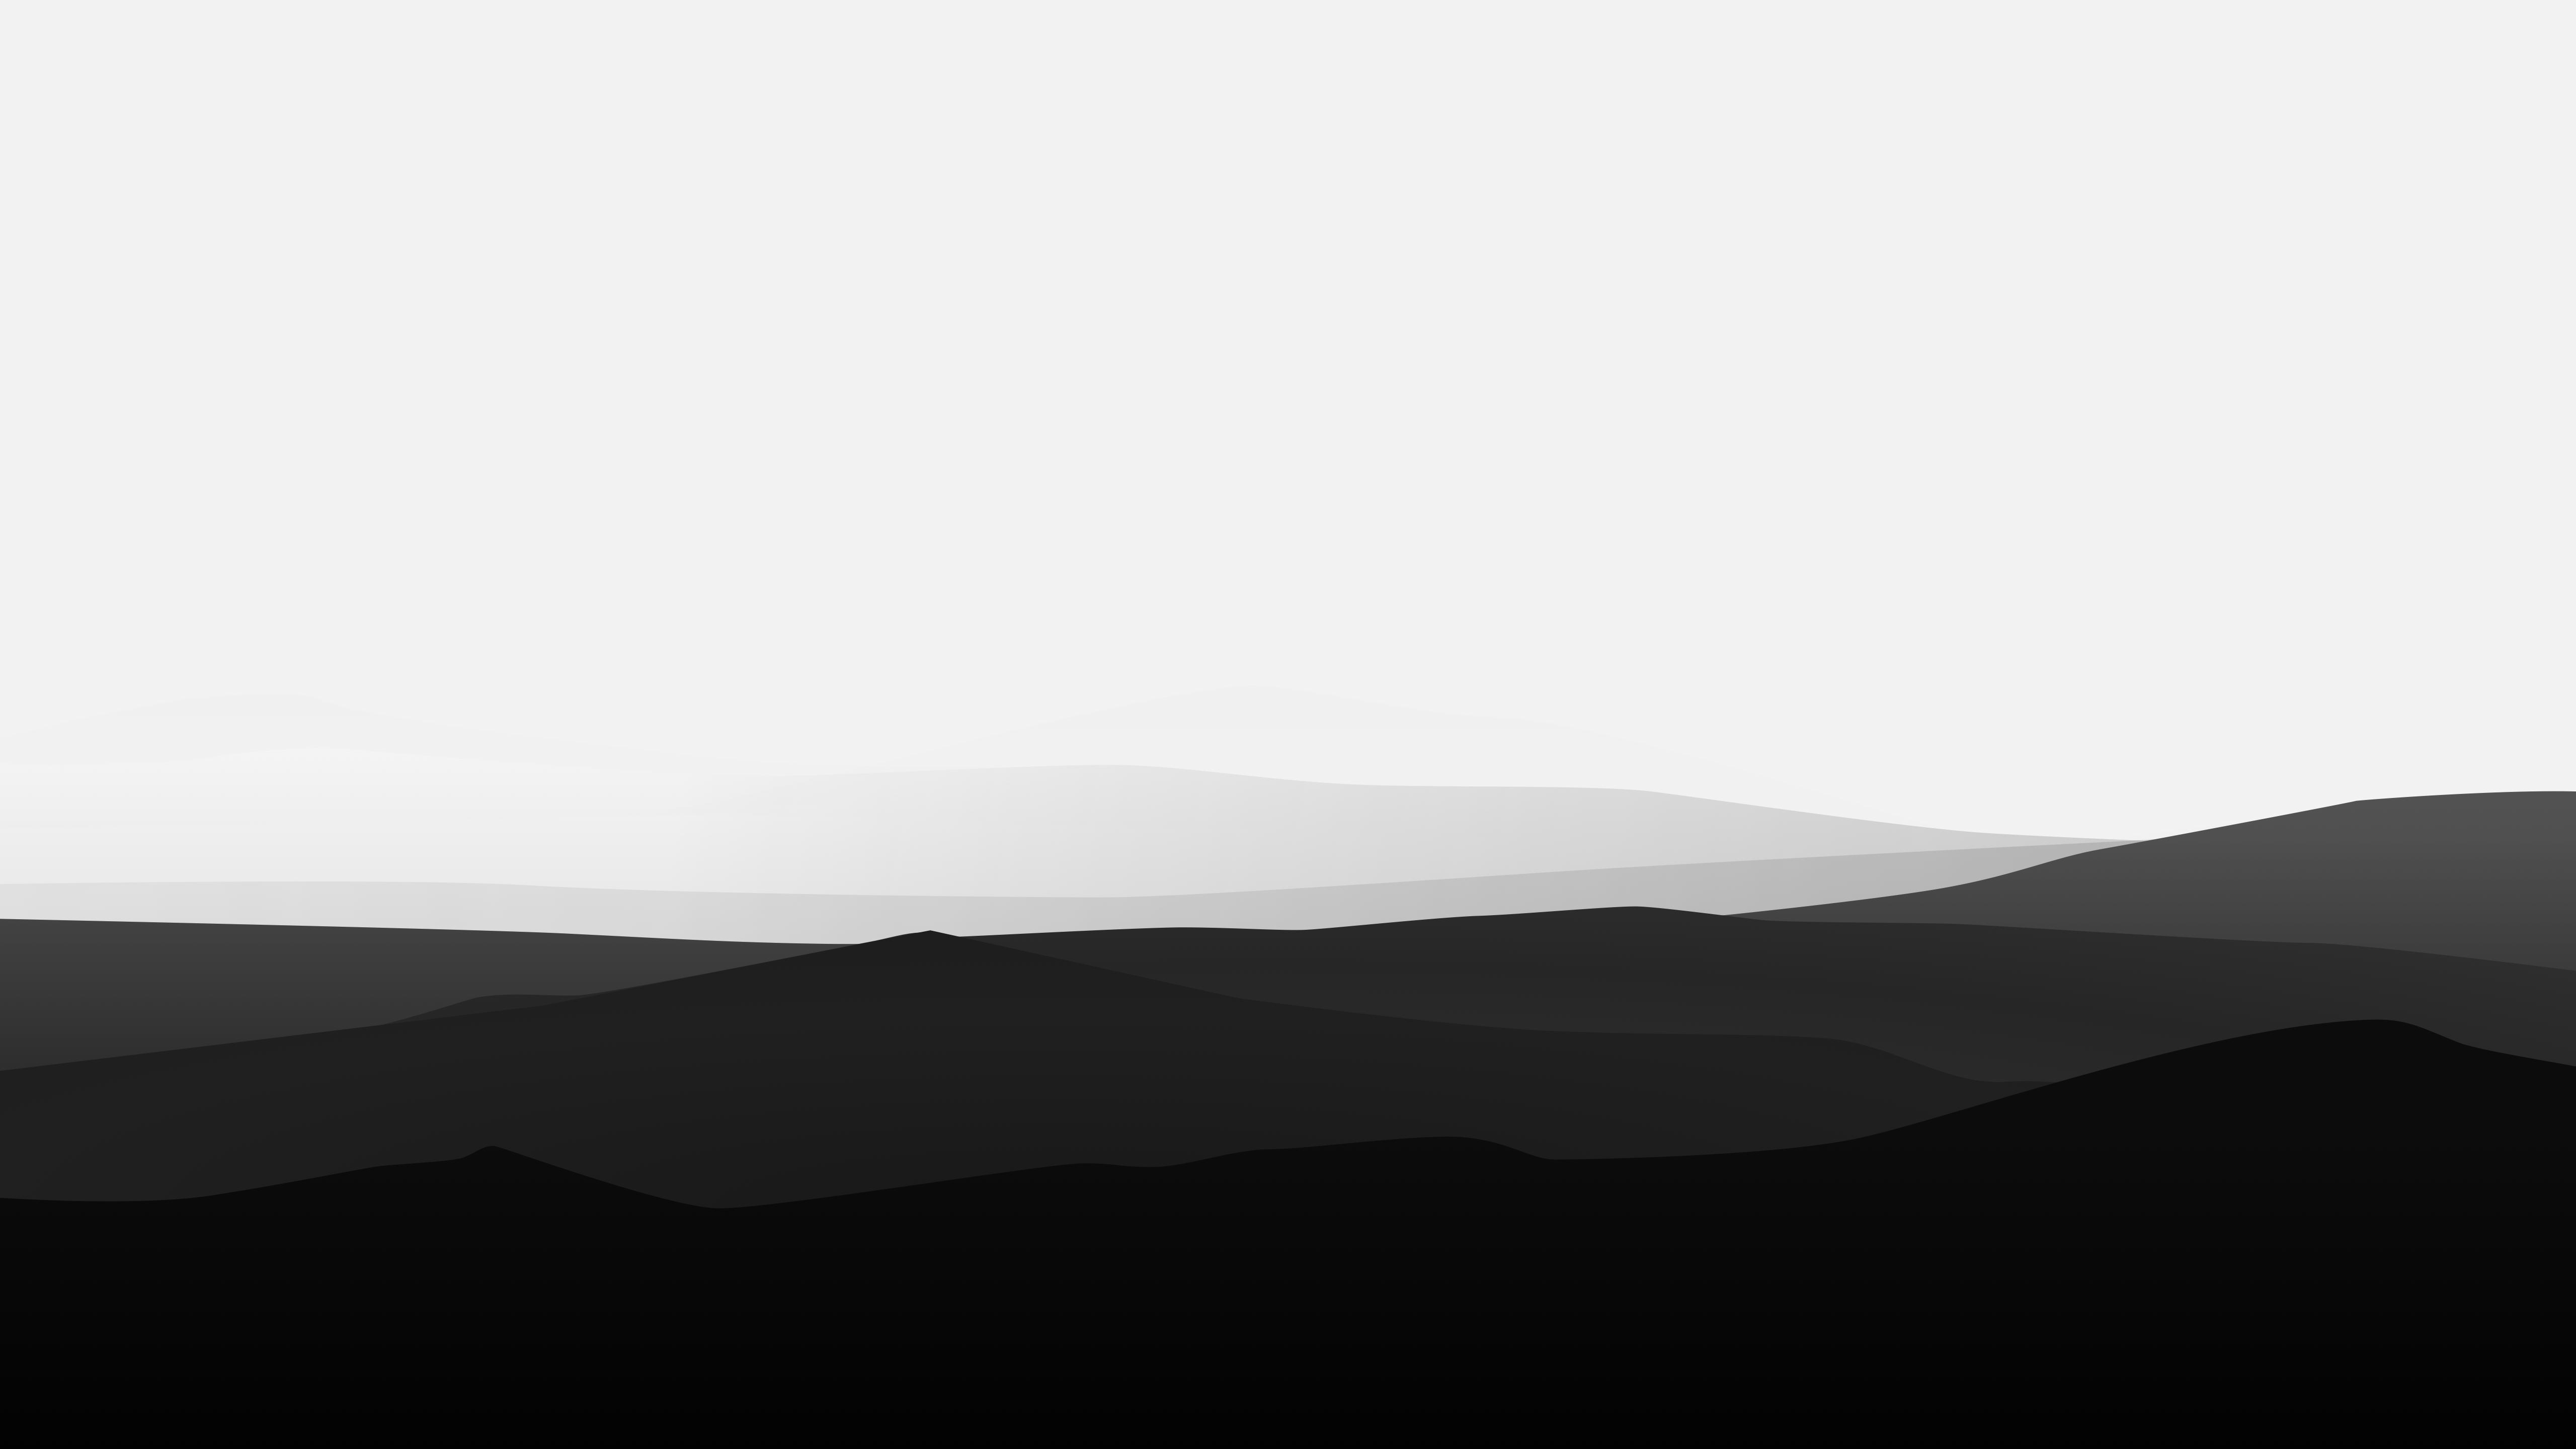 Black And White Minimalist   5120x2880   Download HD Wallpaper 5120x2880